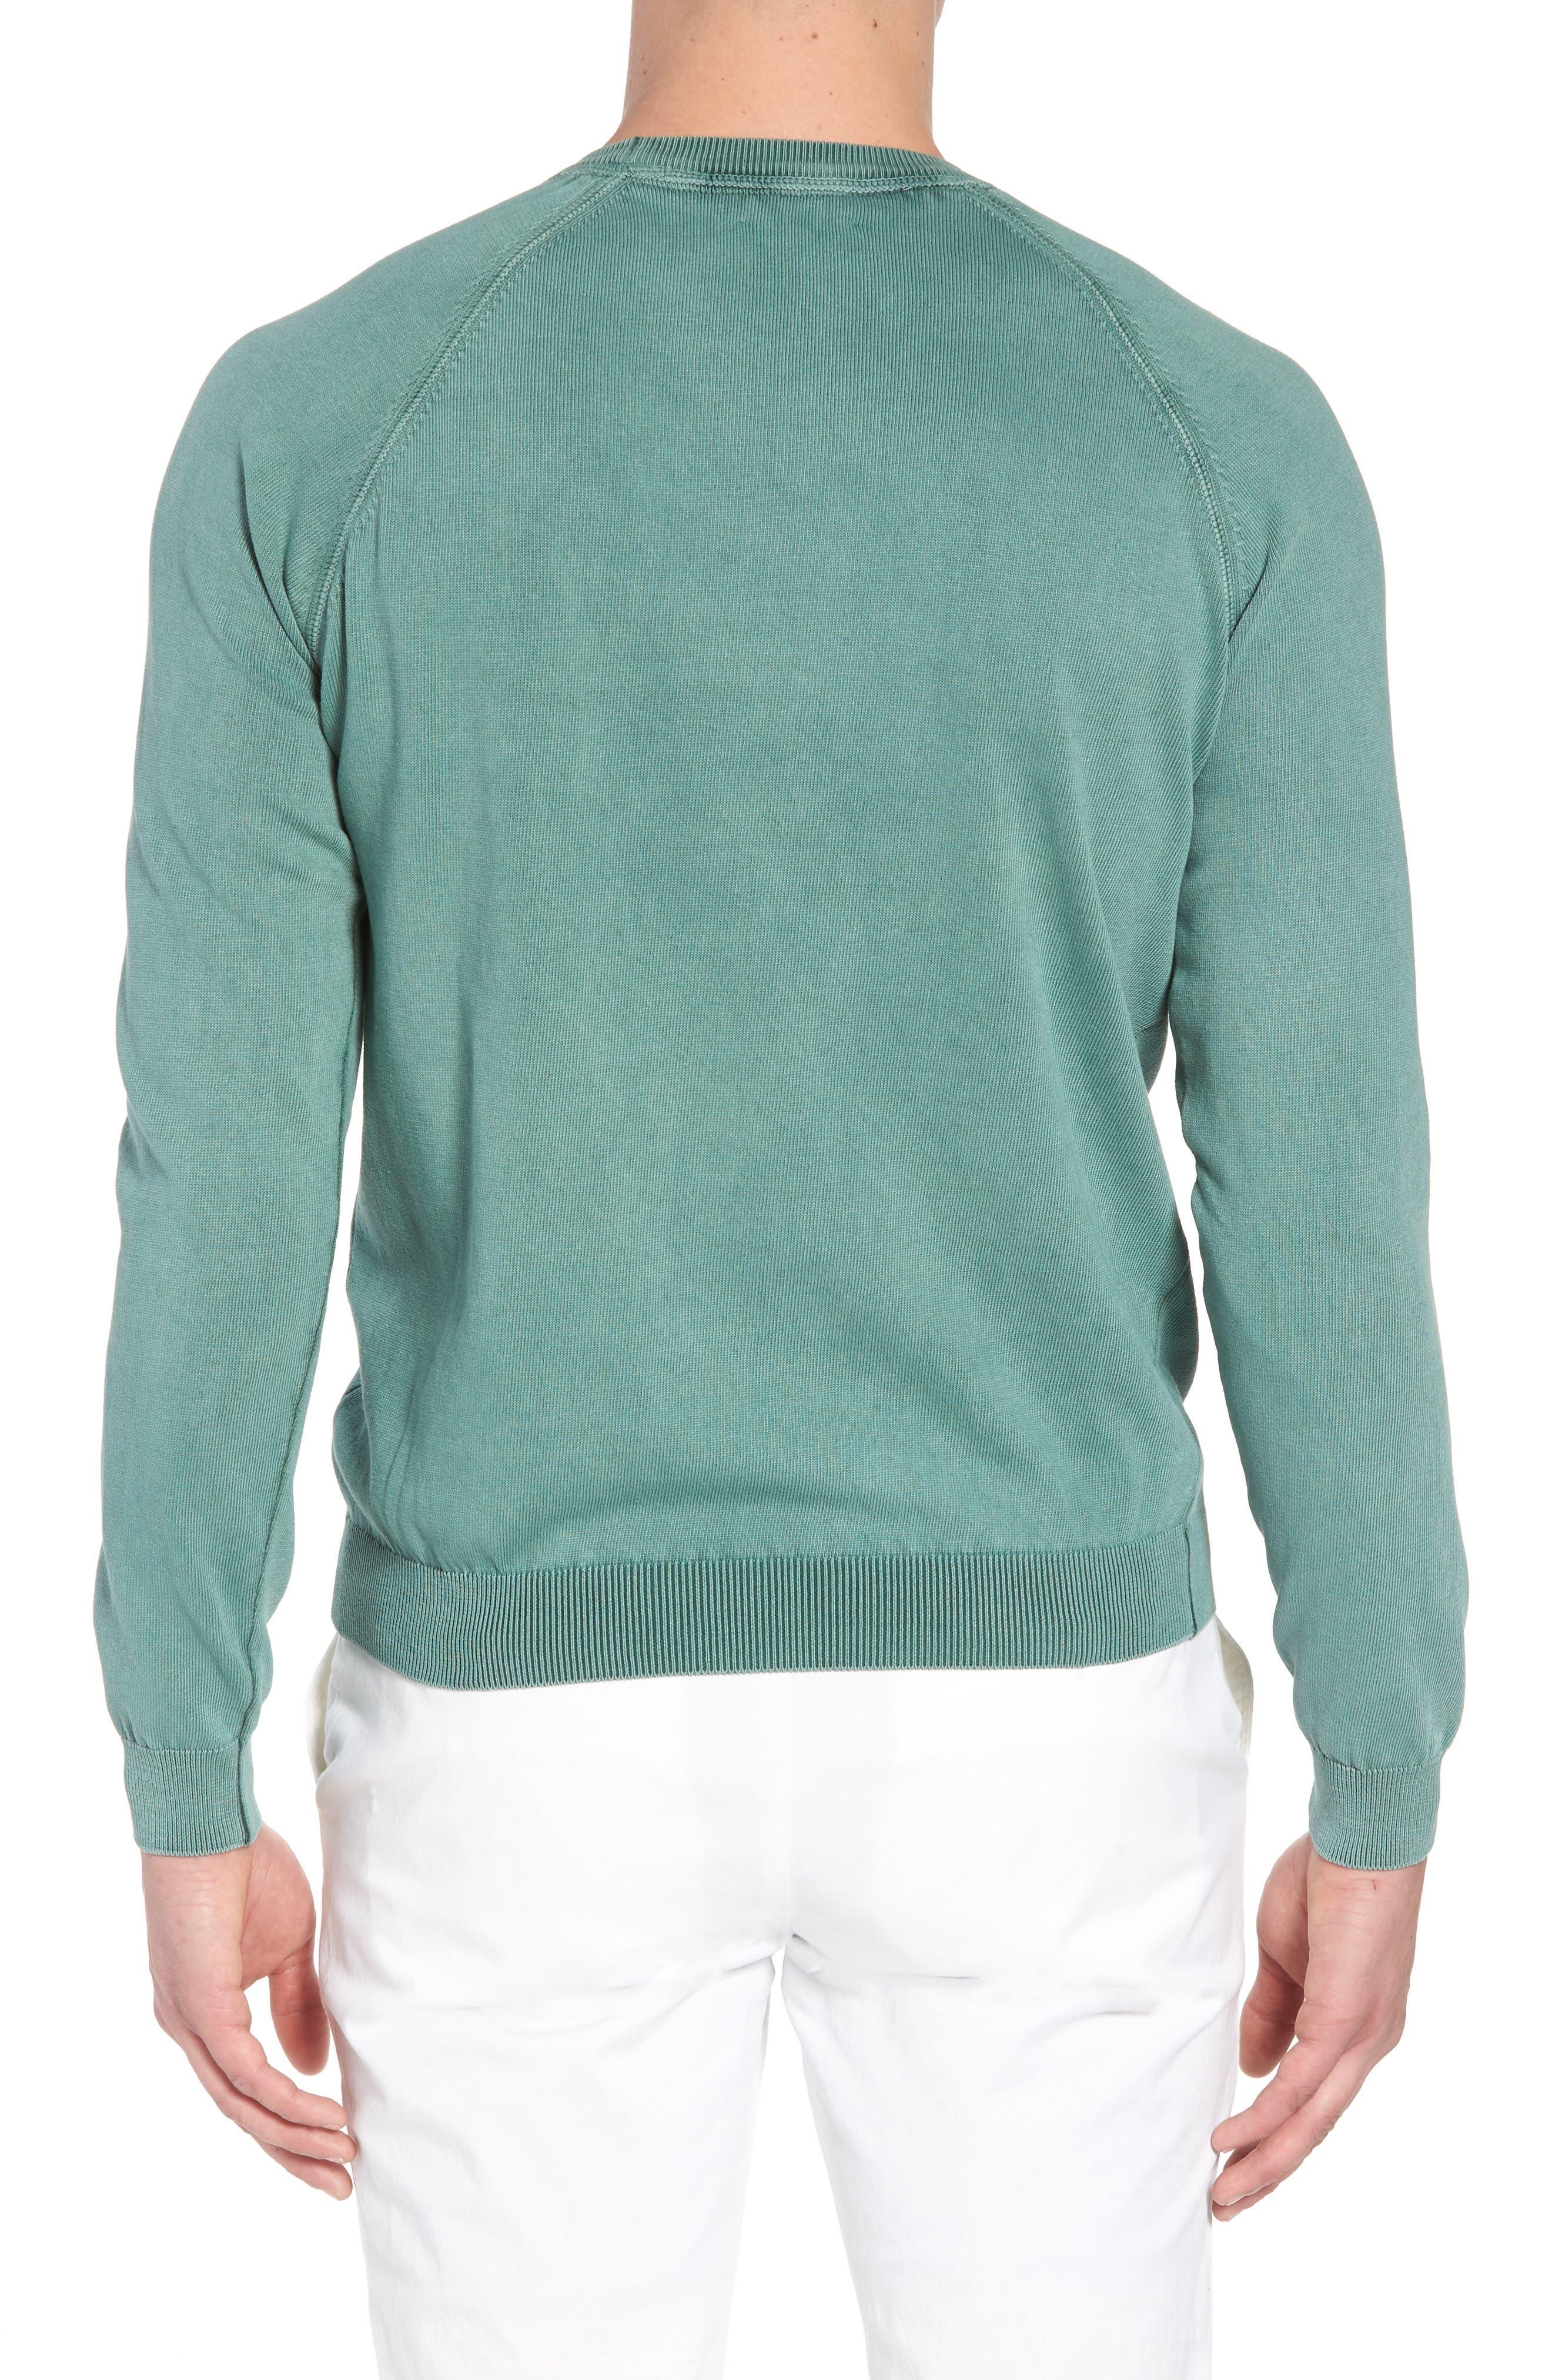 Stonewash Cotton Sweatshirt,                             Alternate thumbnail 2, color,                             333